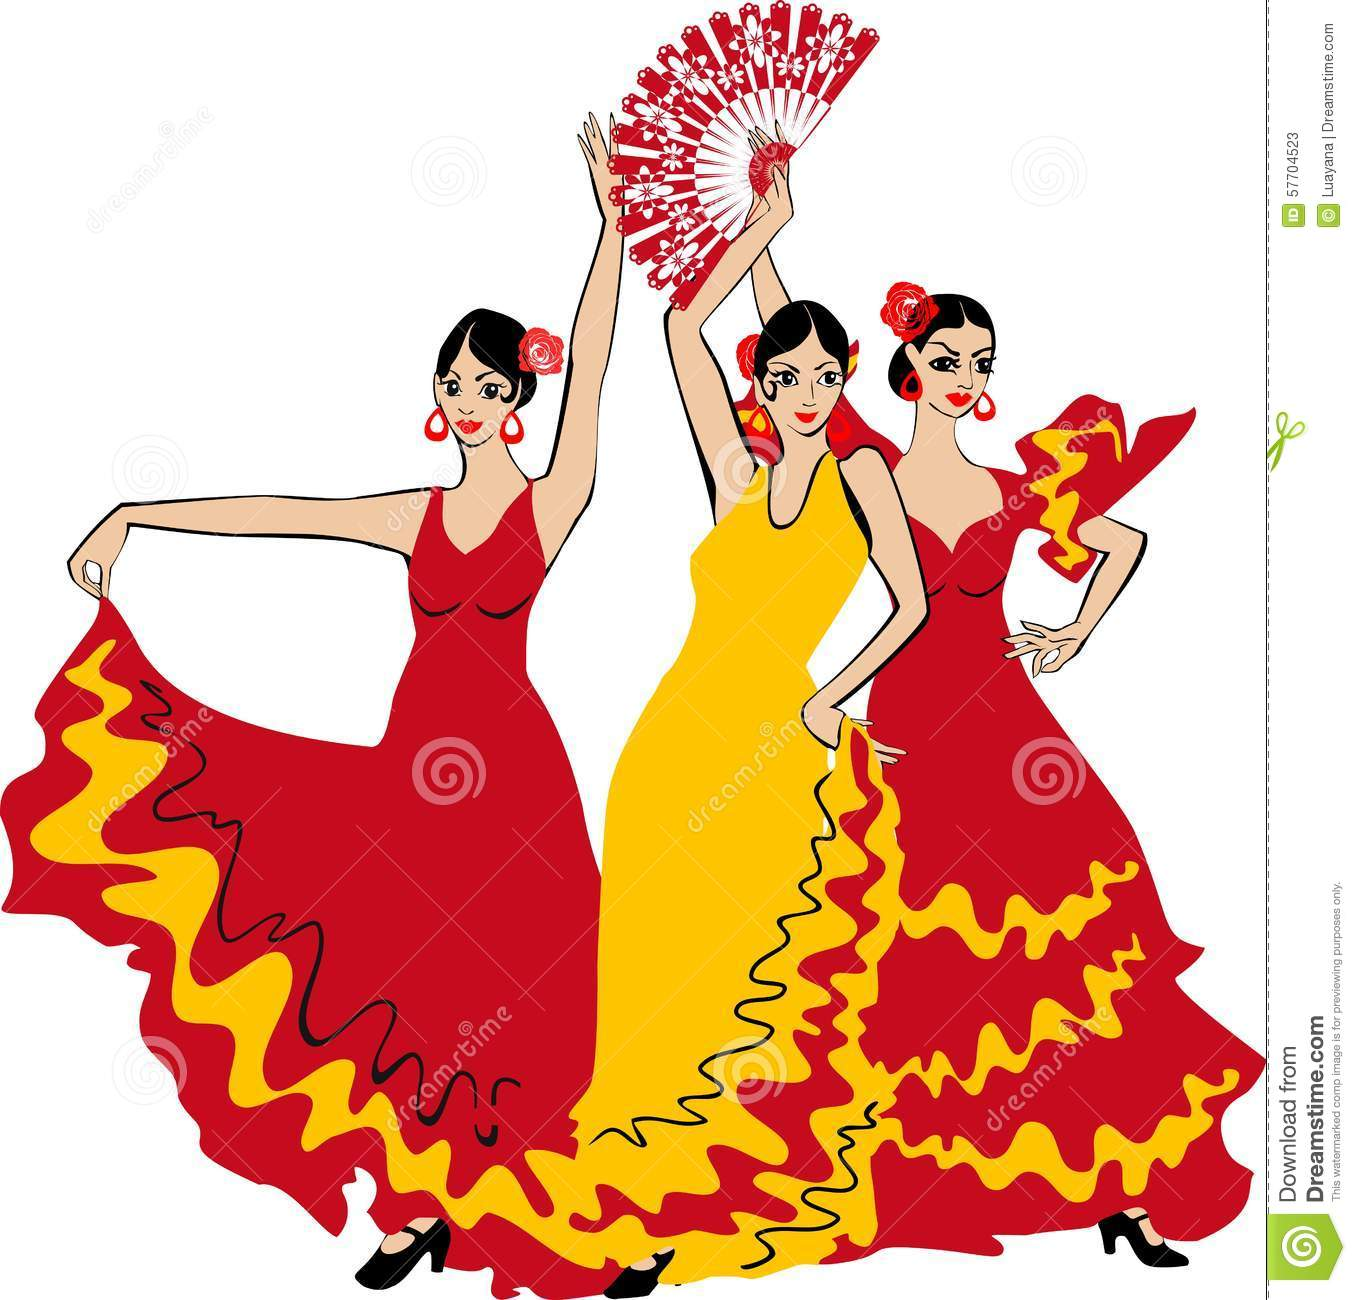 Spanish Flamenco Clipart.